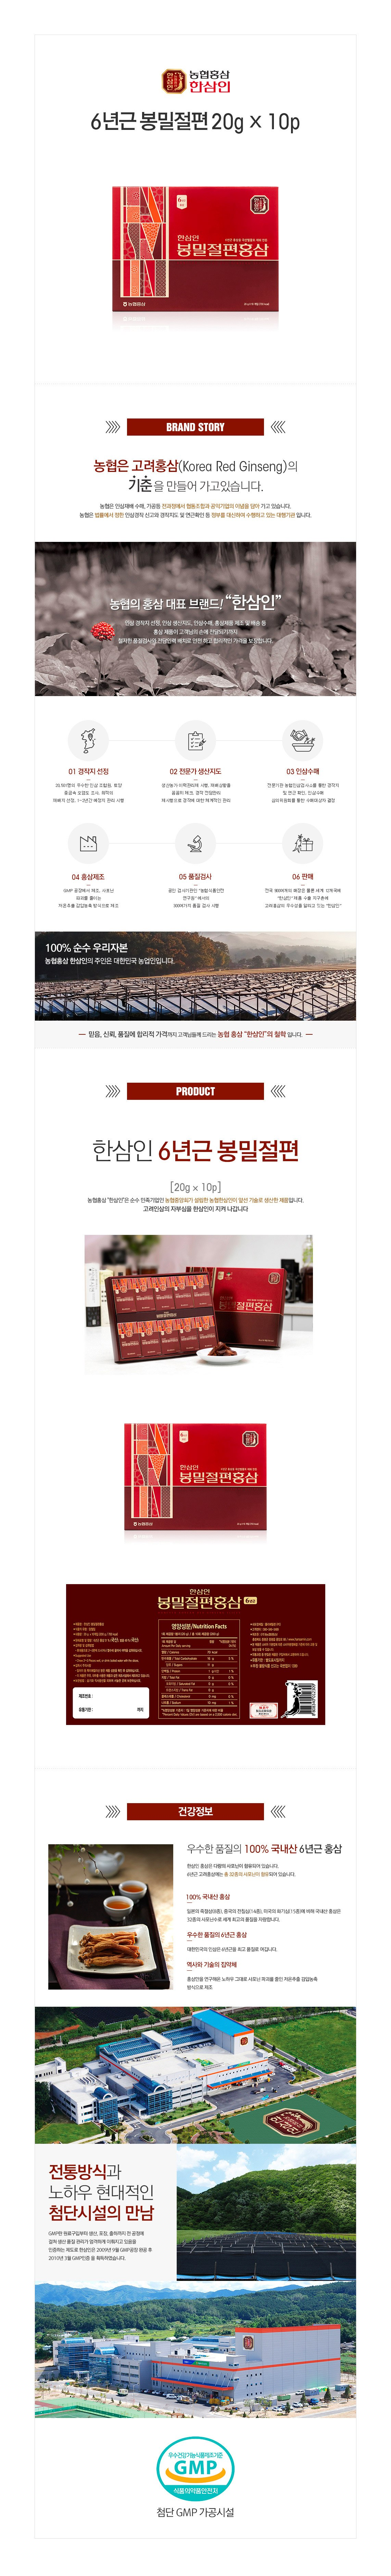 Honeyed Korean Red Ginseng Slices 0.71(20g) 10 Packs 1+1 Set